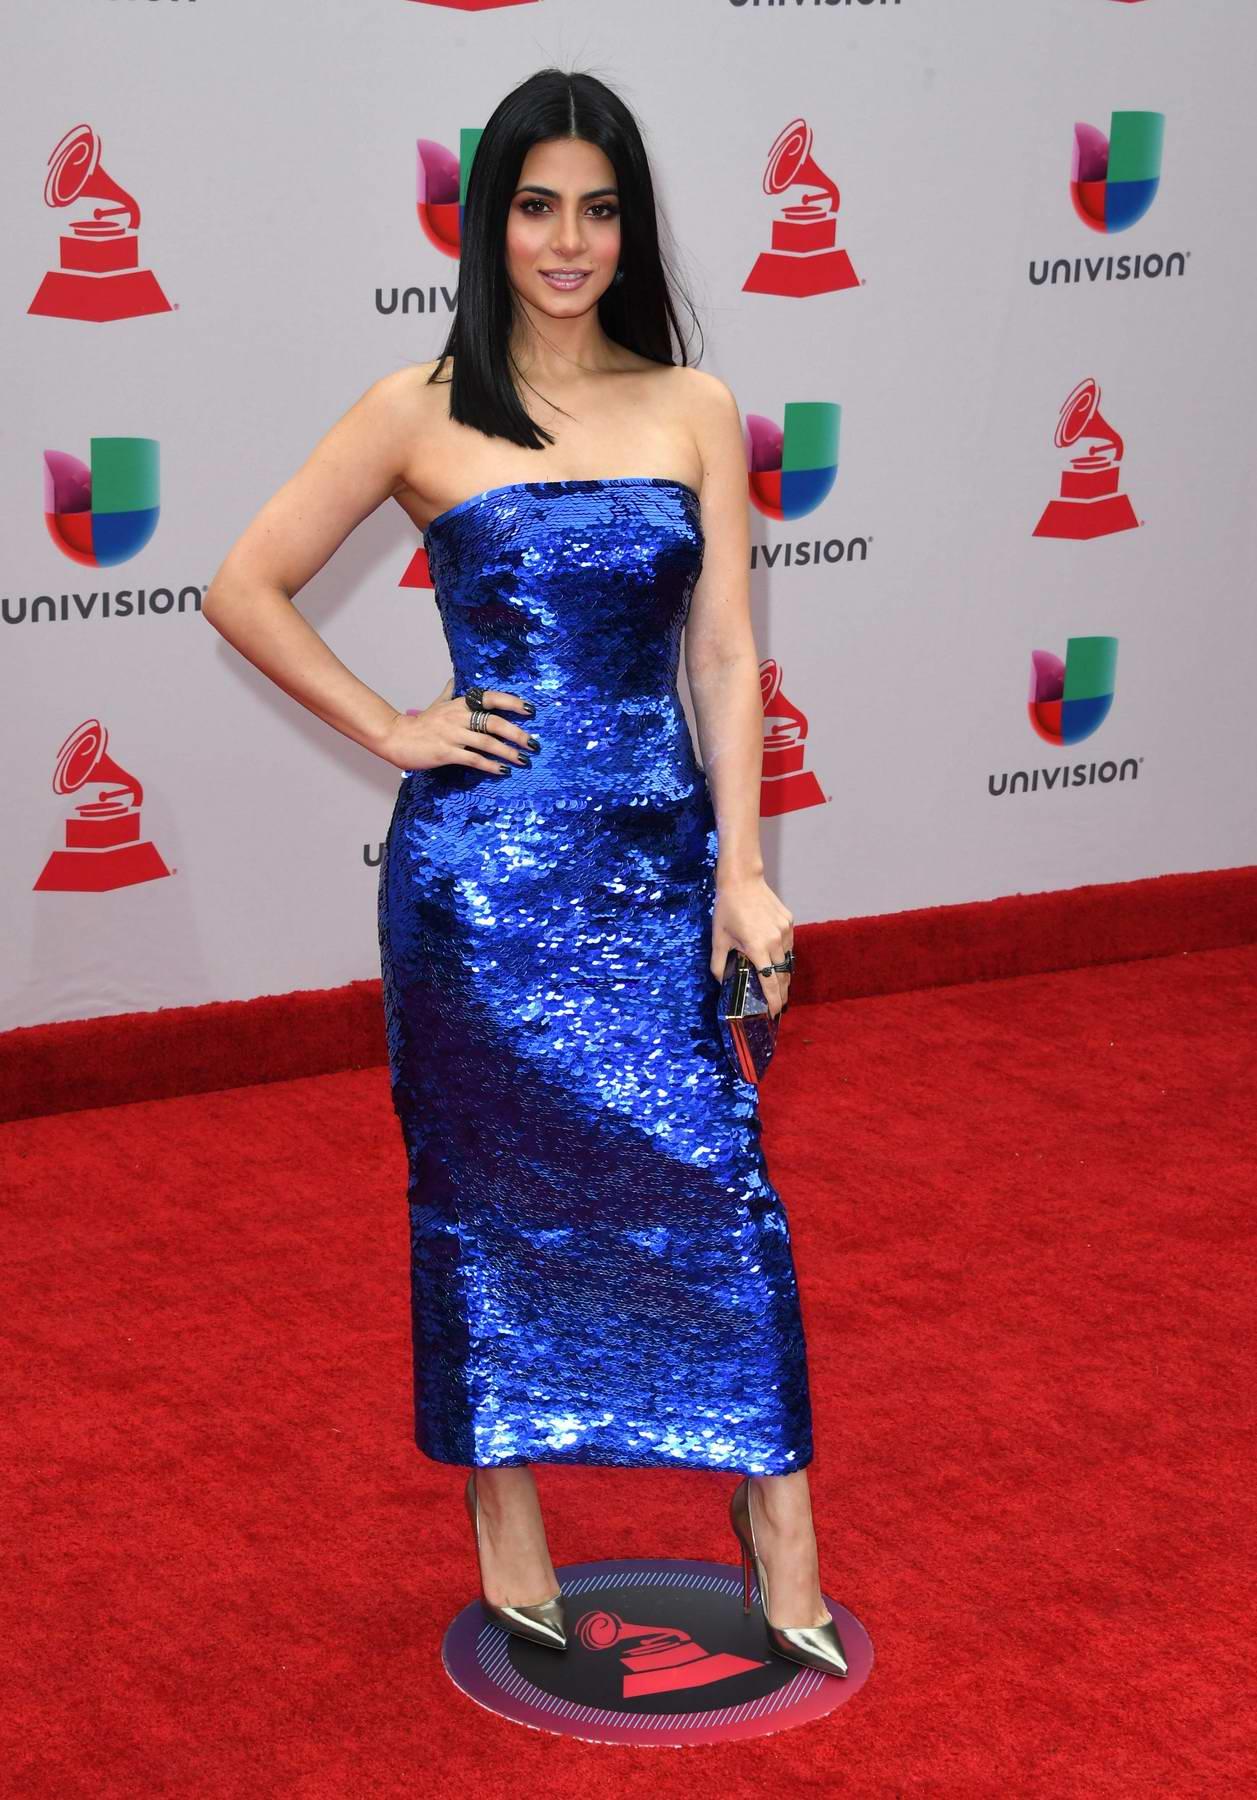 Emeraude Toubia at the 18th Annual Latin Grammy Awards in Las Vegas